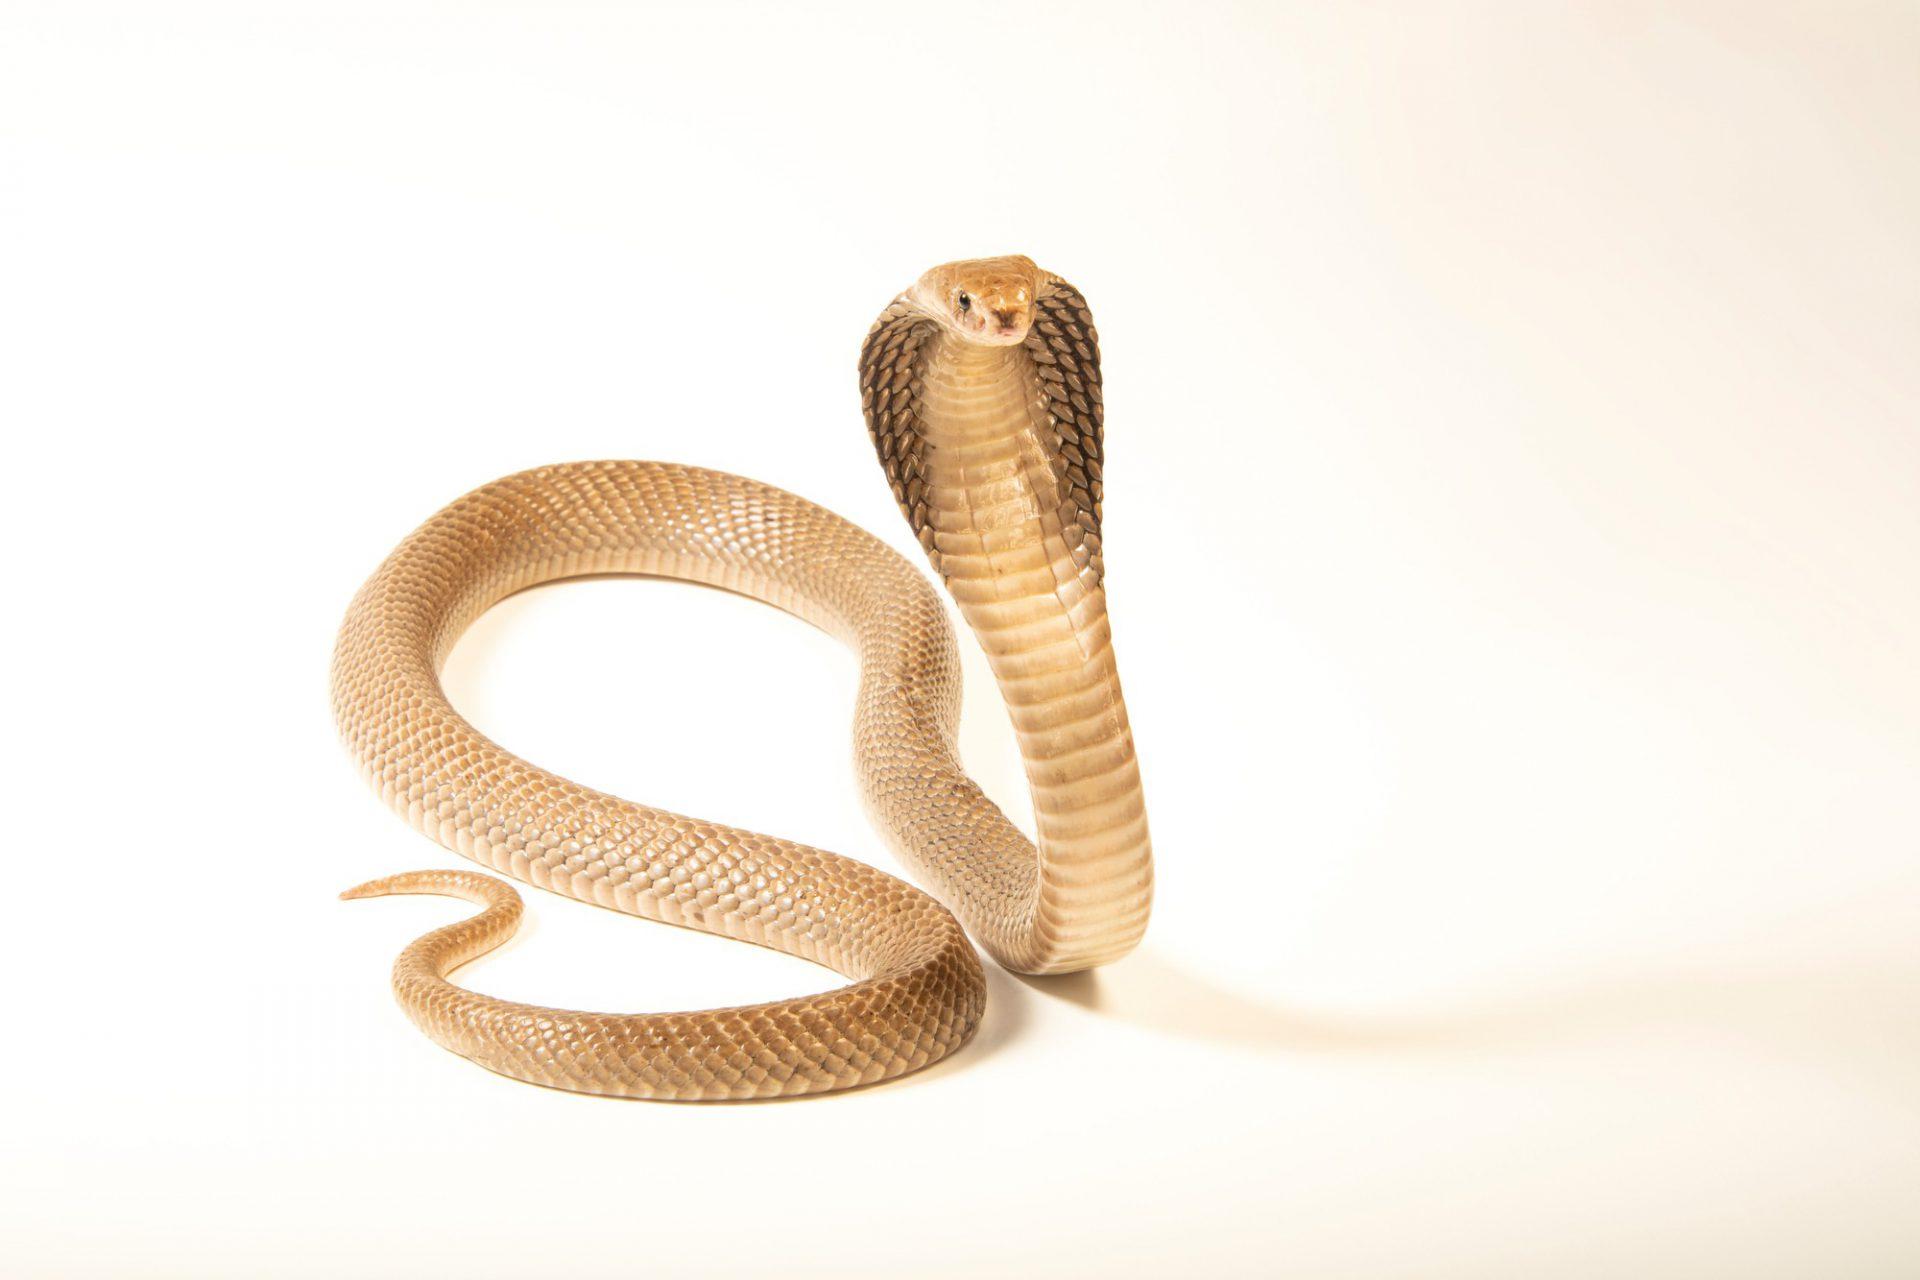 Photo: An Indonesian spitting cobra (Naja sputatrix) in Jakarta, Indonesia in the care of PT. Alam Nusantara Jayatama.